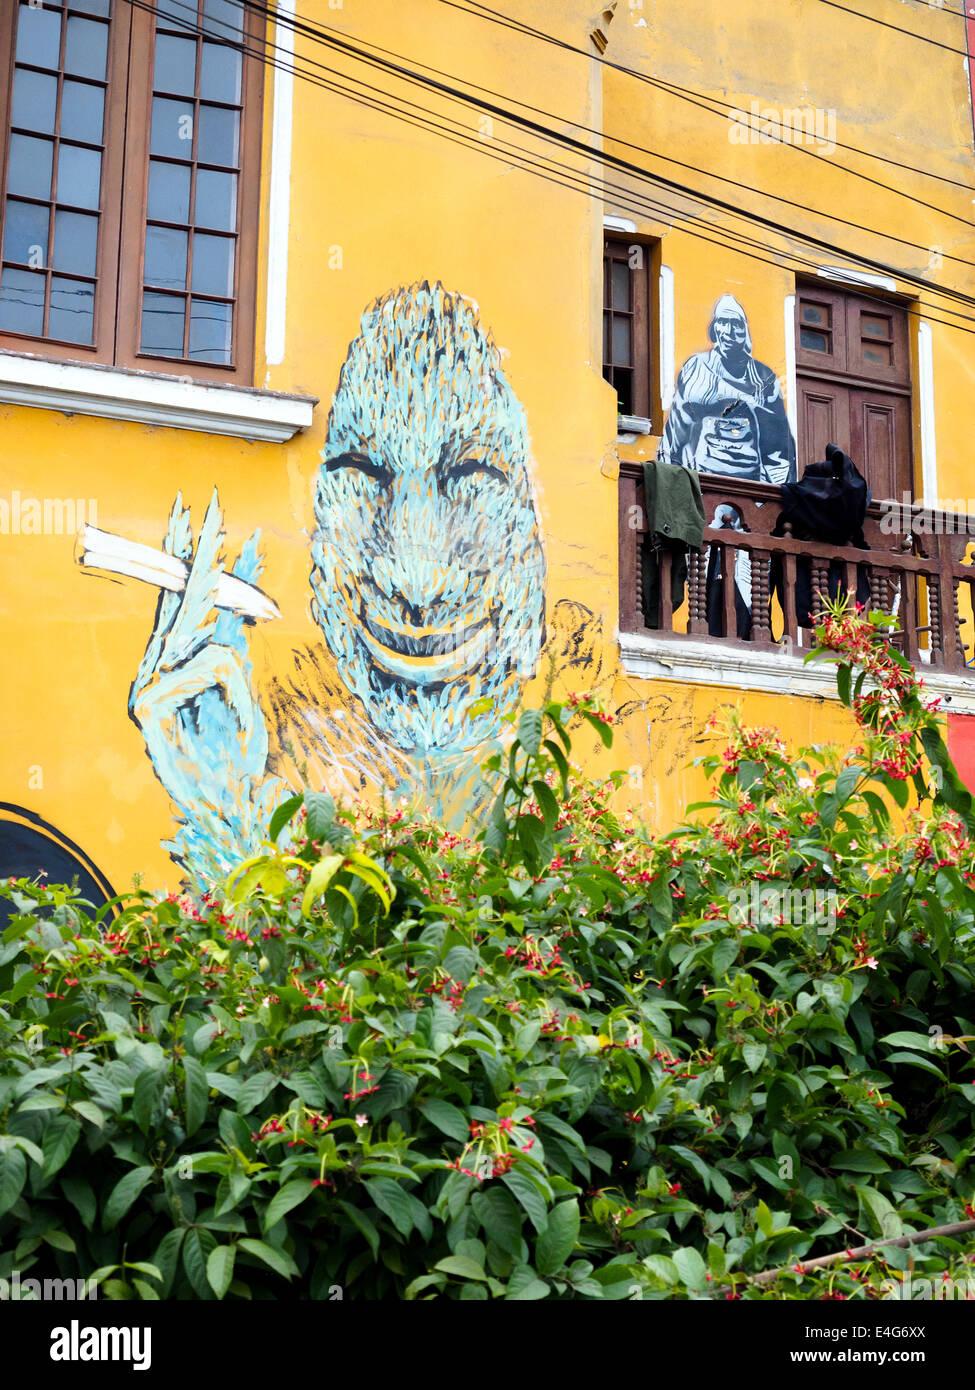 Lima Barranco Art Stock Photos & Lima Barranco Art Stock Images - Alamy